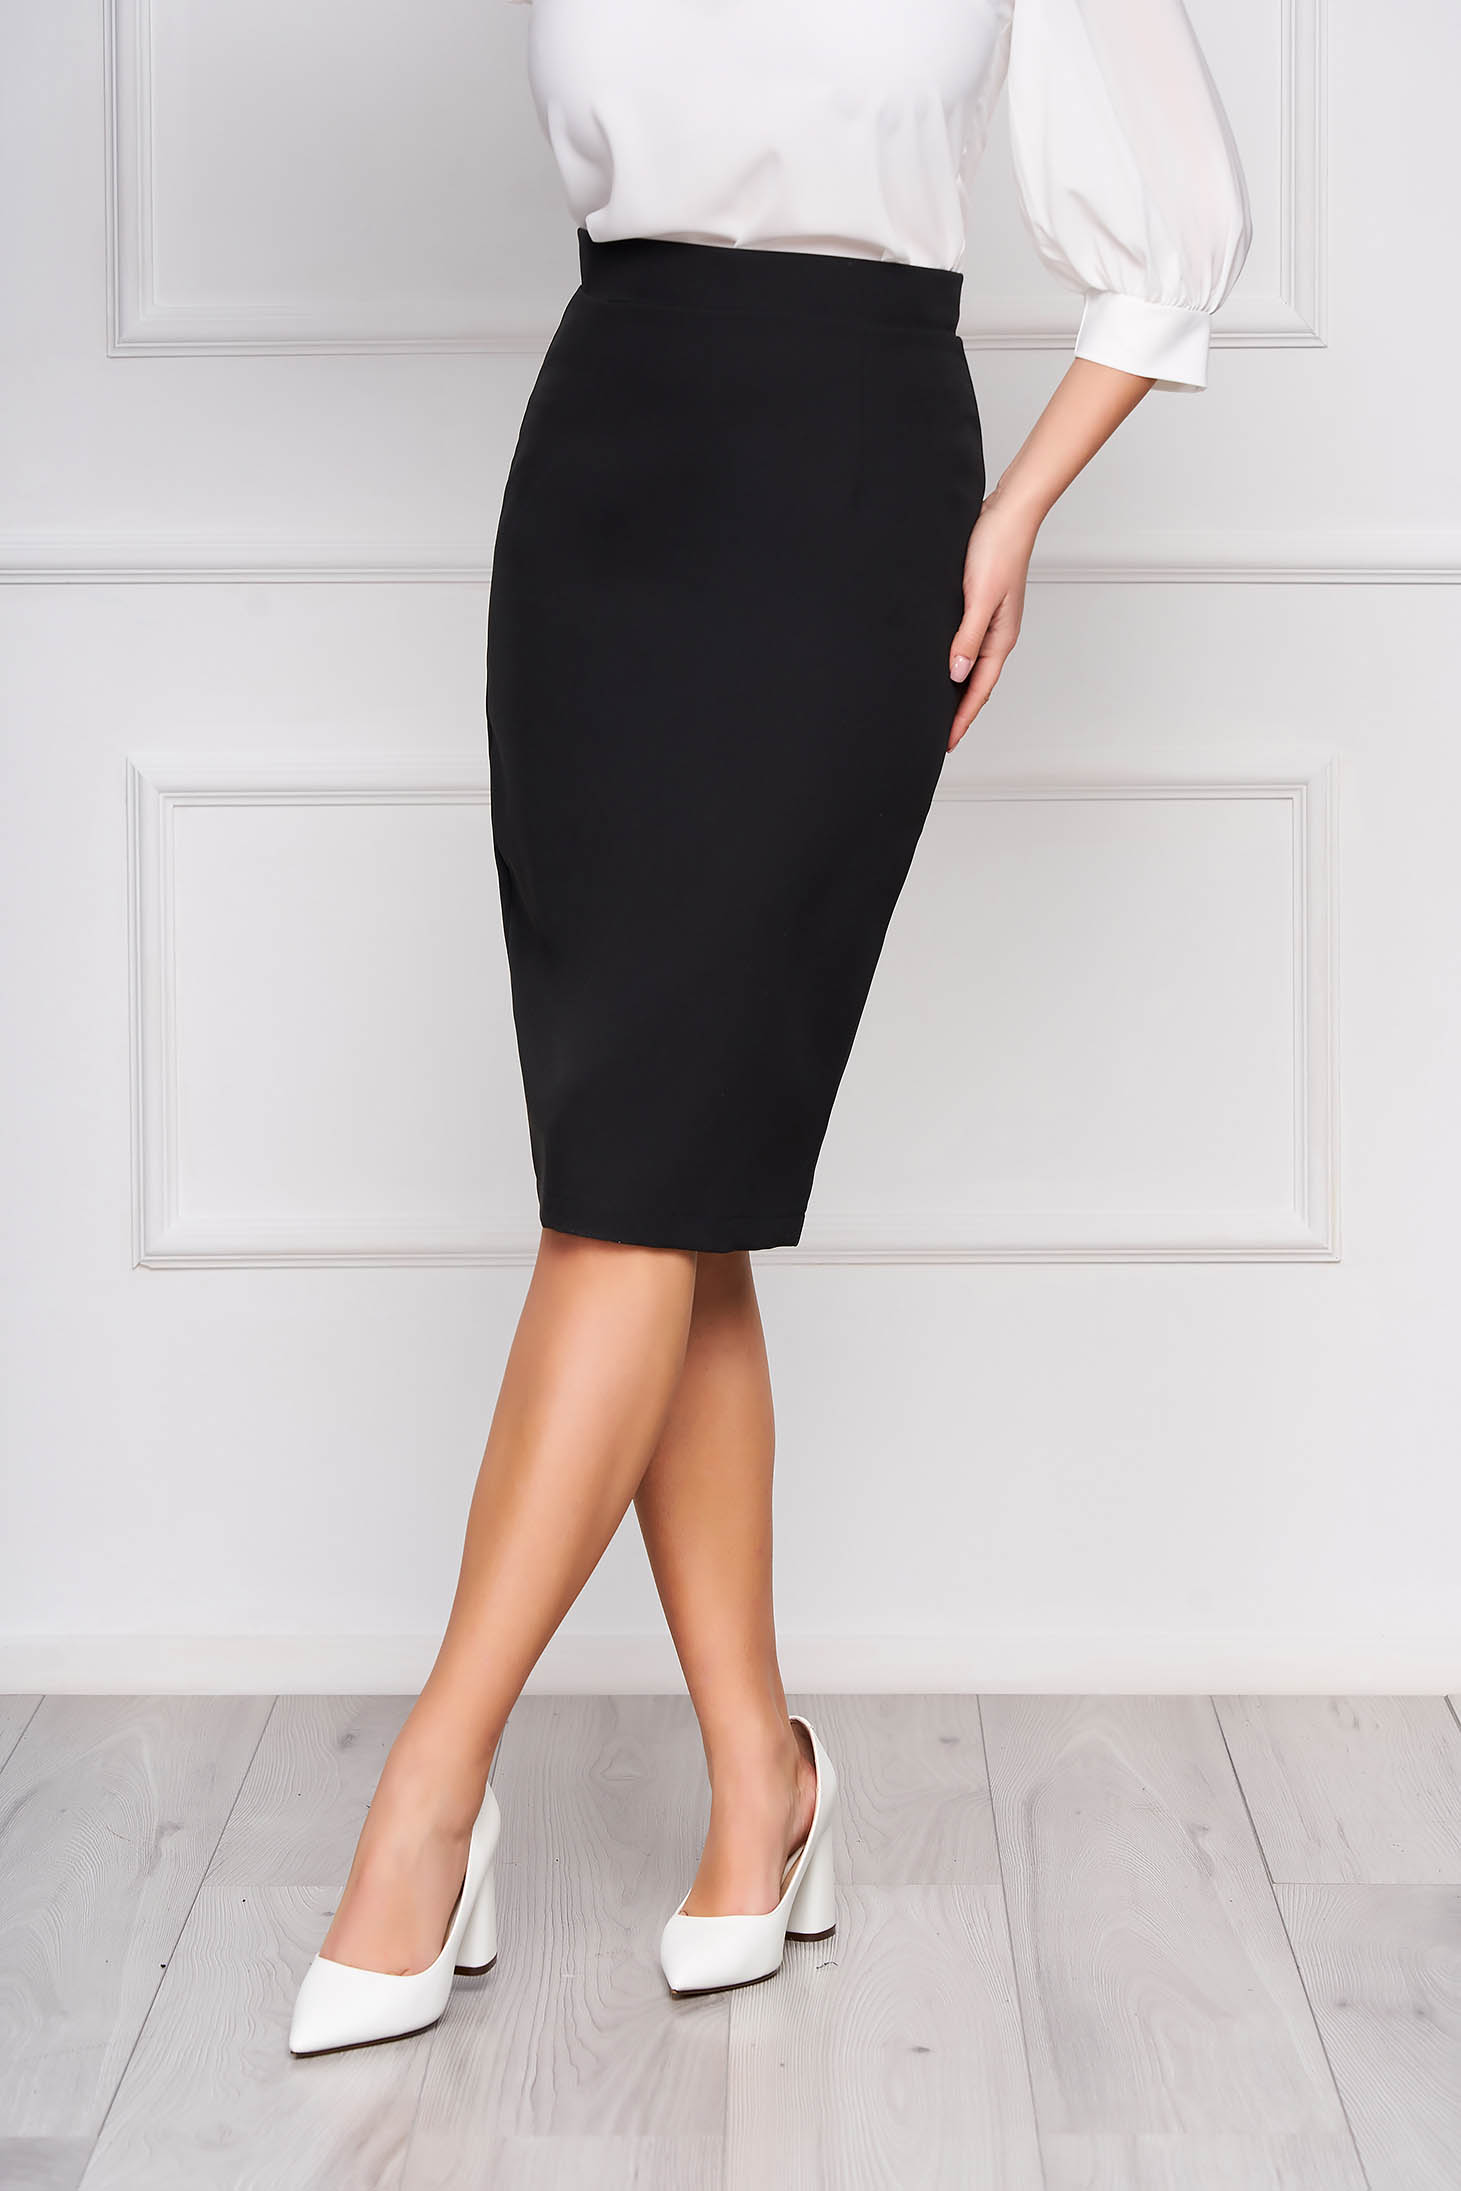 StarShinerS black high waisted office pencil skirt slightly elastic fabric